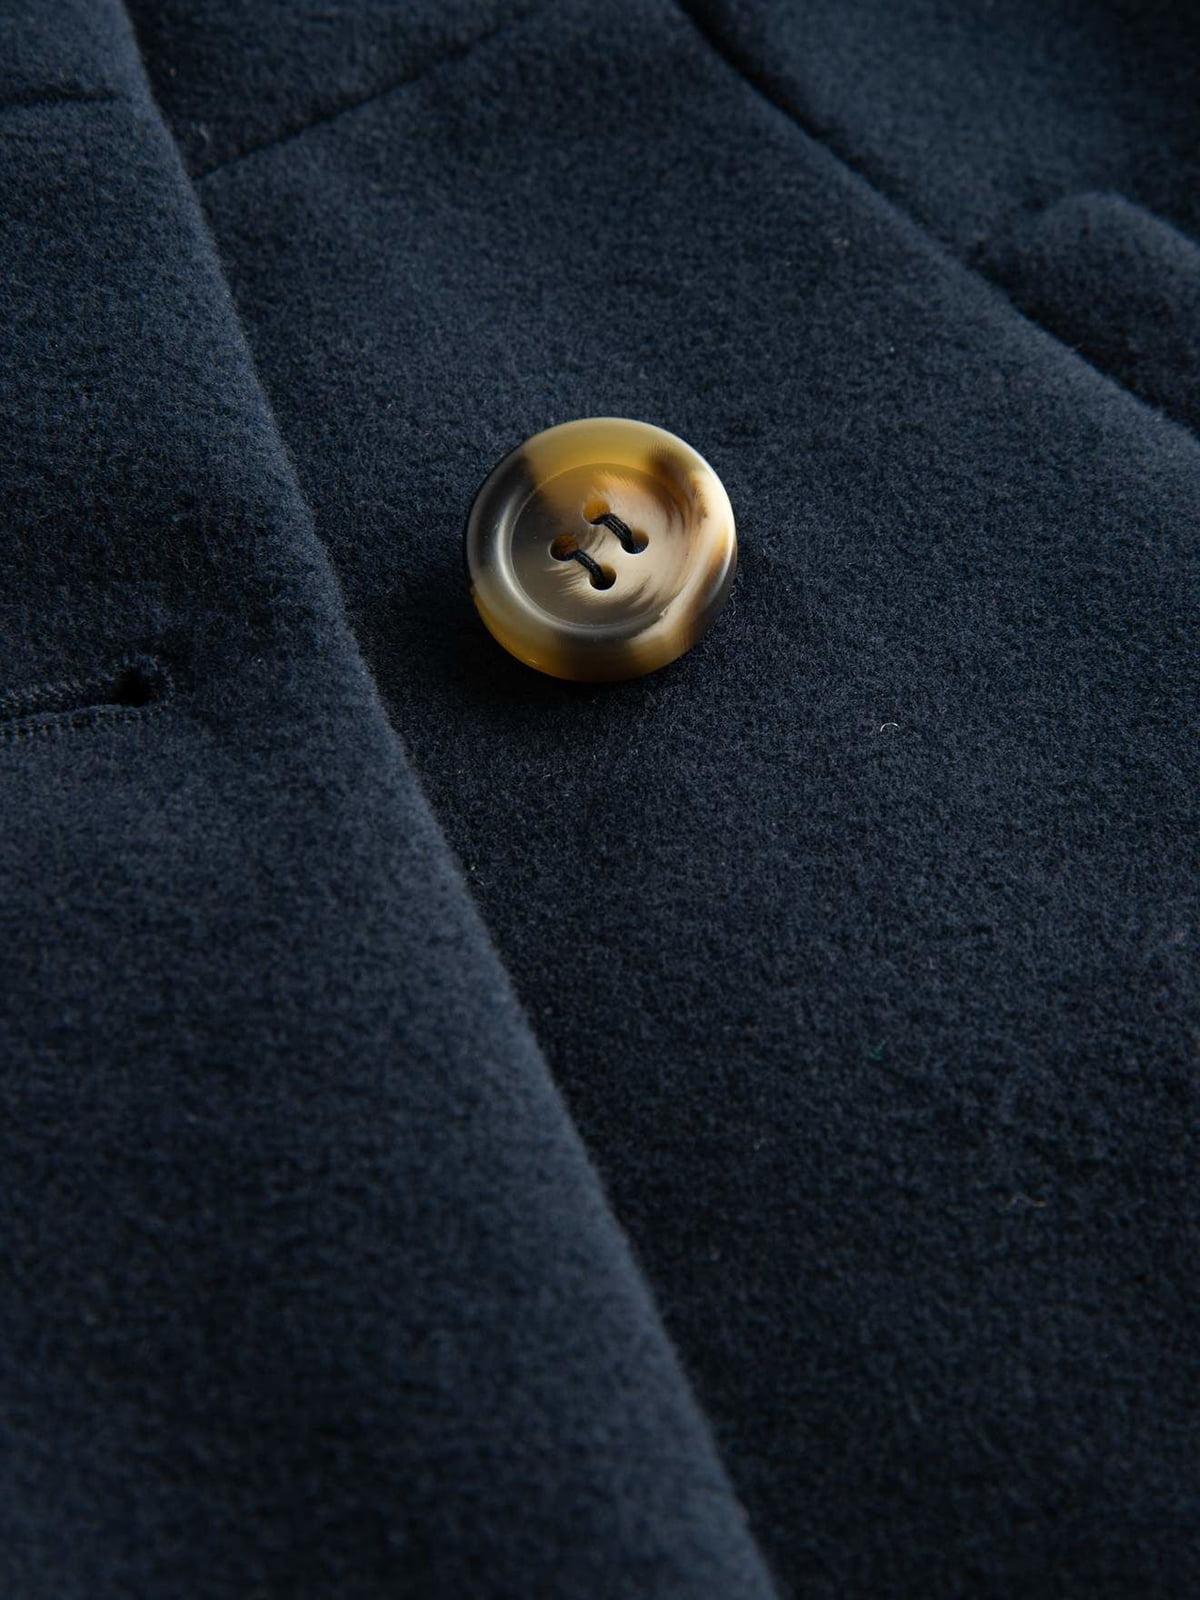 Пальто синє | 4677712 | фото 12